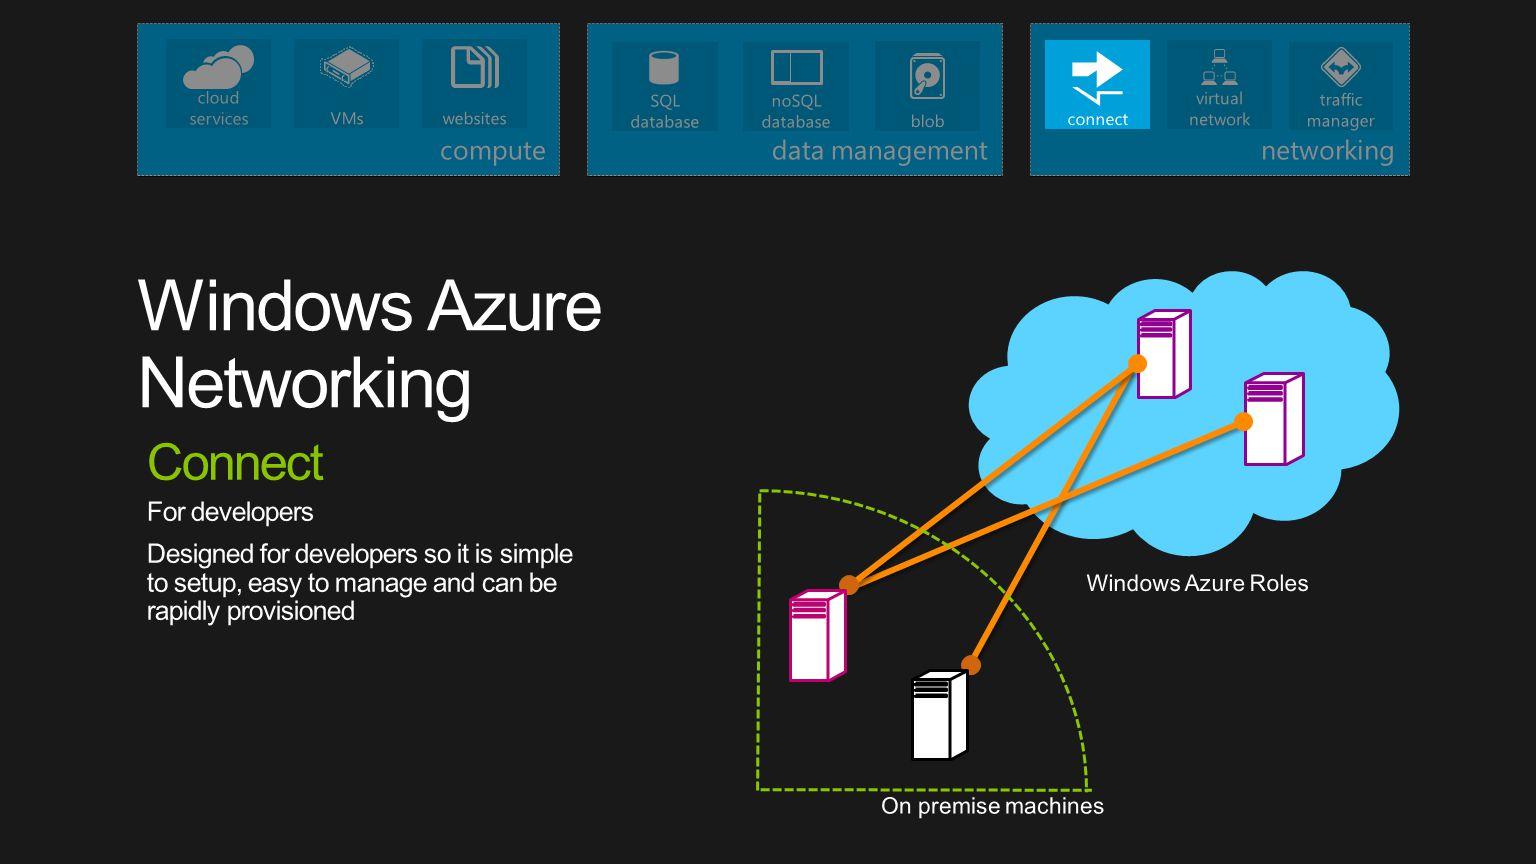 Windows Azure Networking